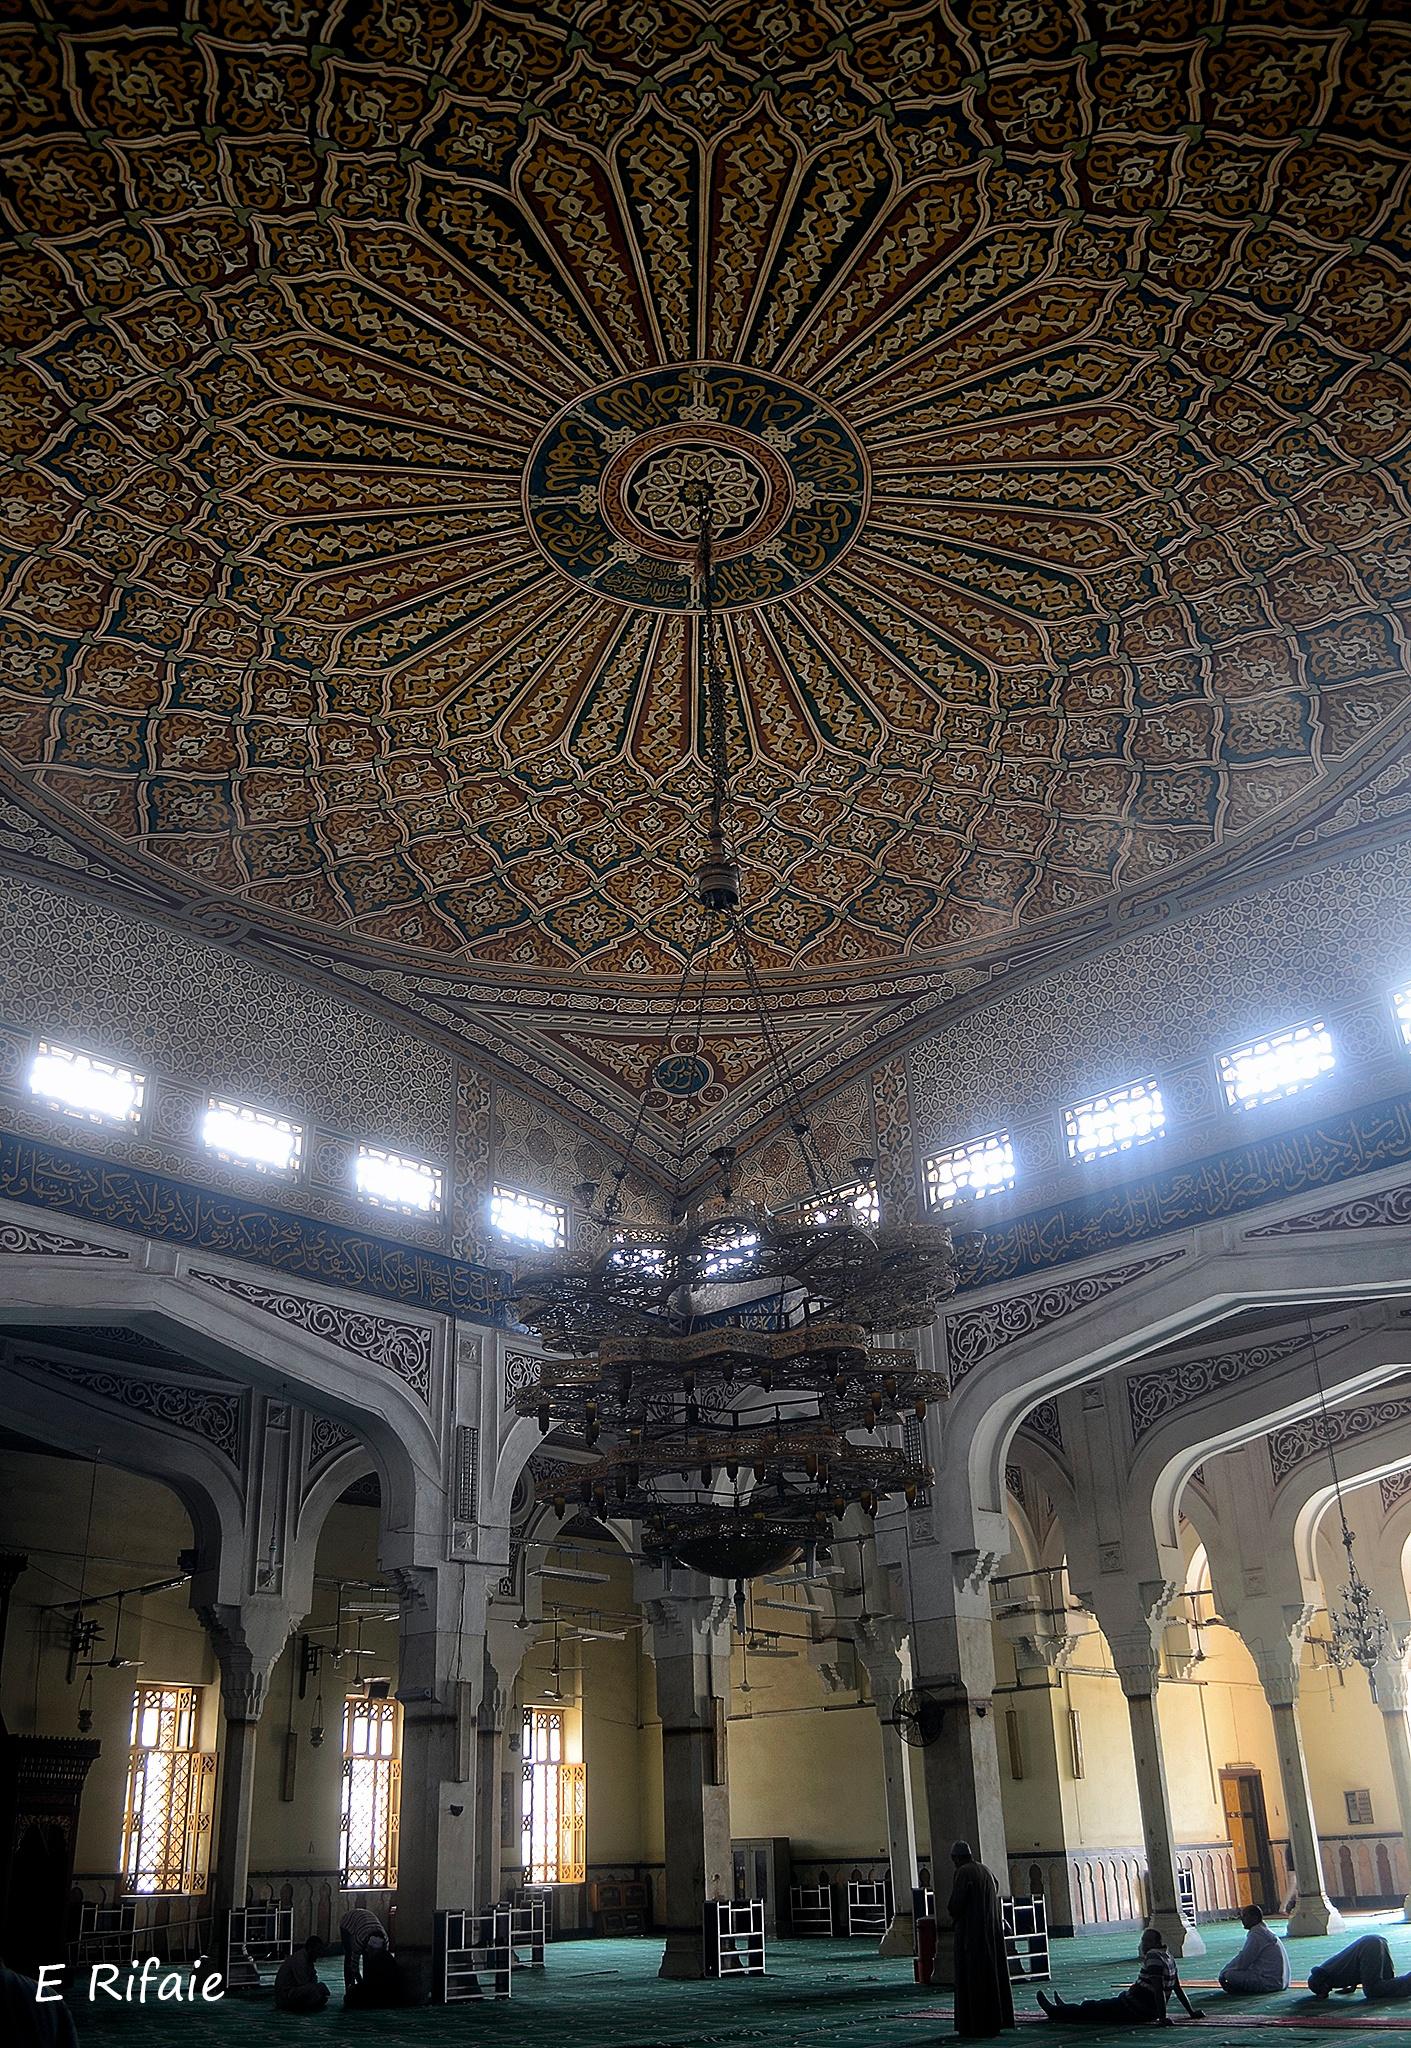 Iberaheem el Desouky mosque by Emad Eldin Moustafa El Refaie